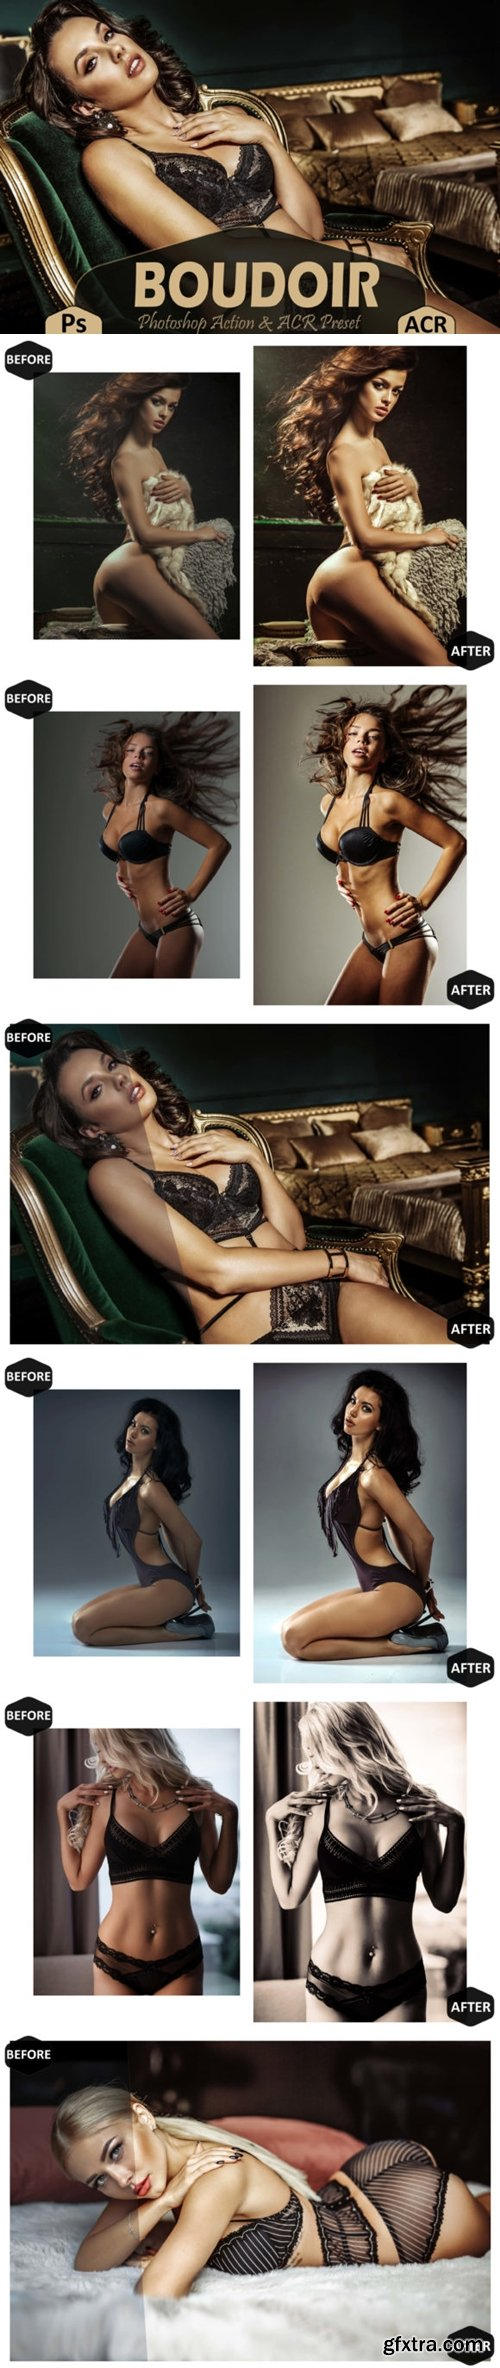 10 Boudoir Photoshop Actions, ACR Preset 3623506